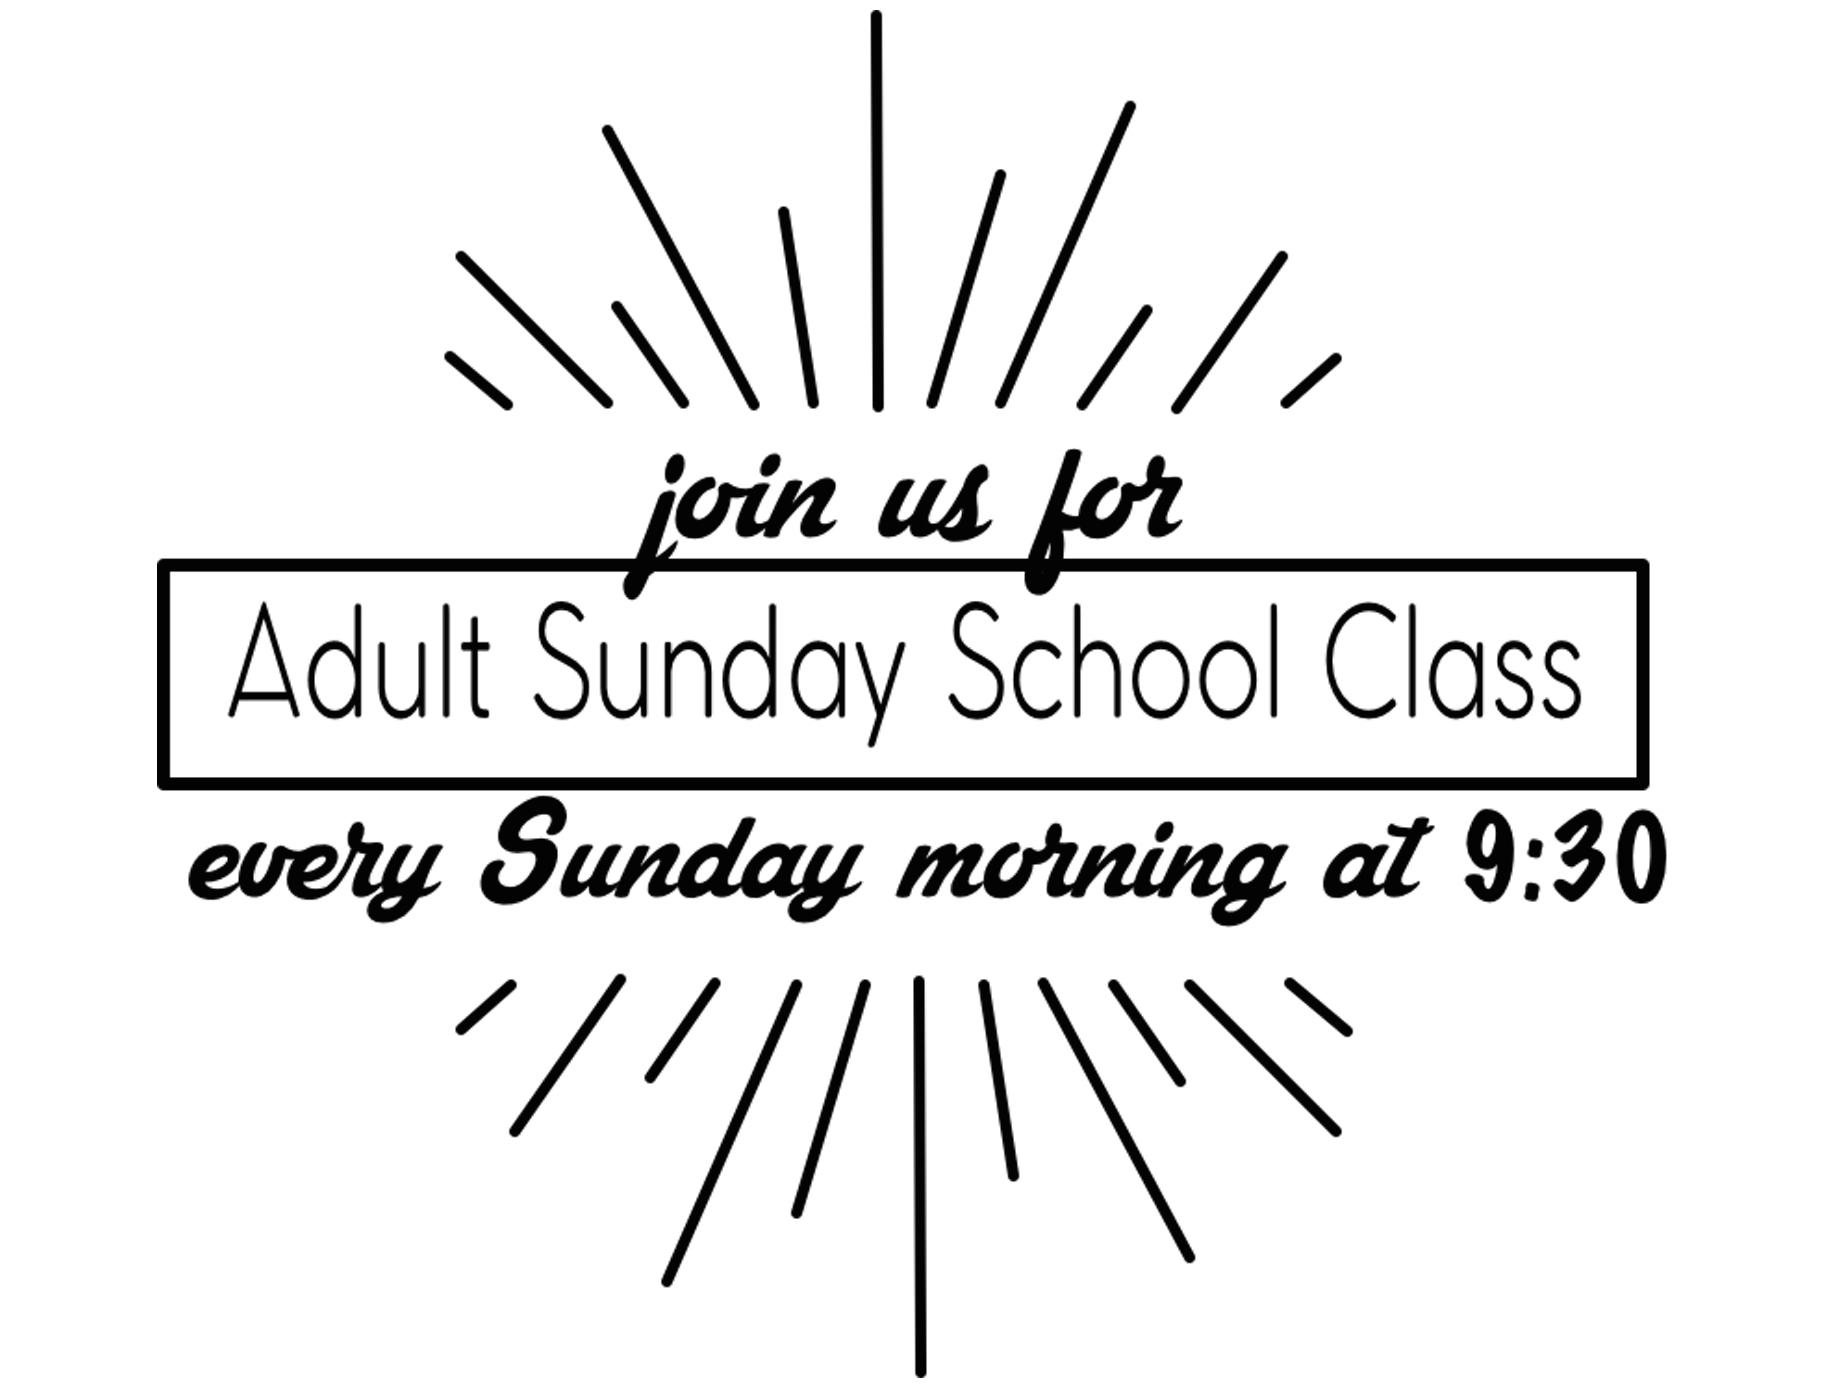 adult sunday school class png.jpg